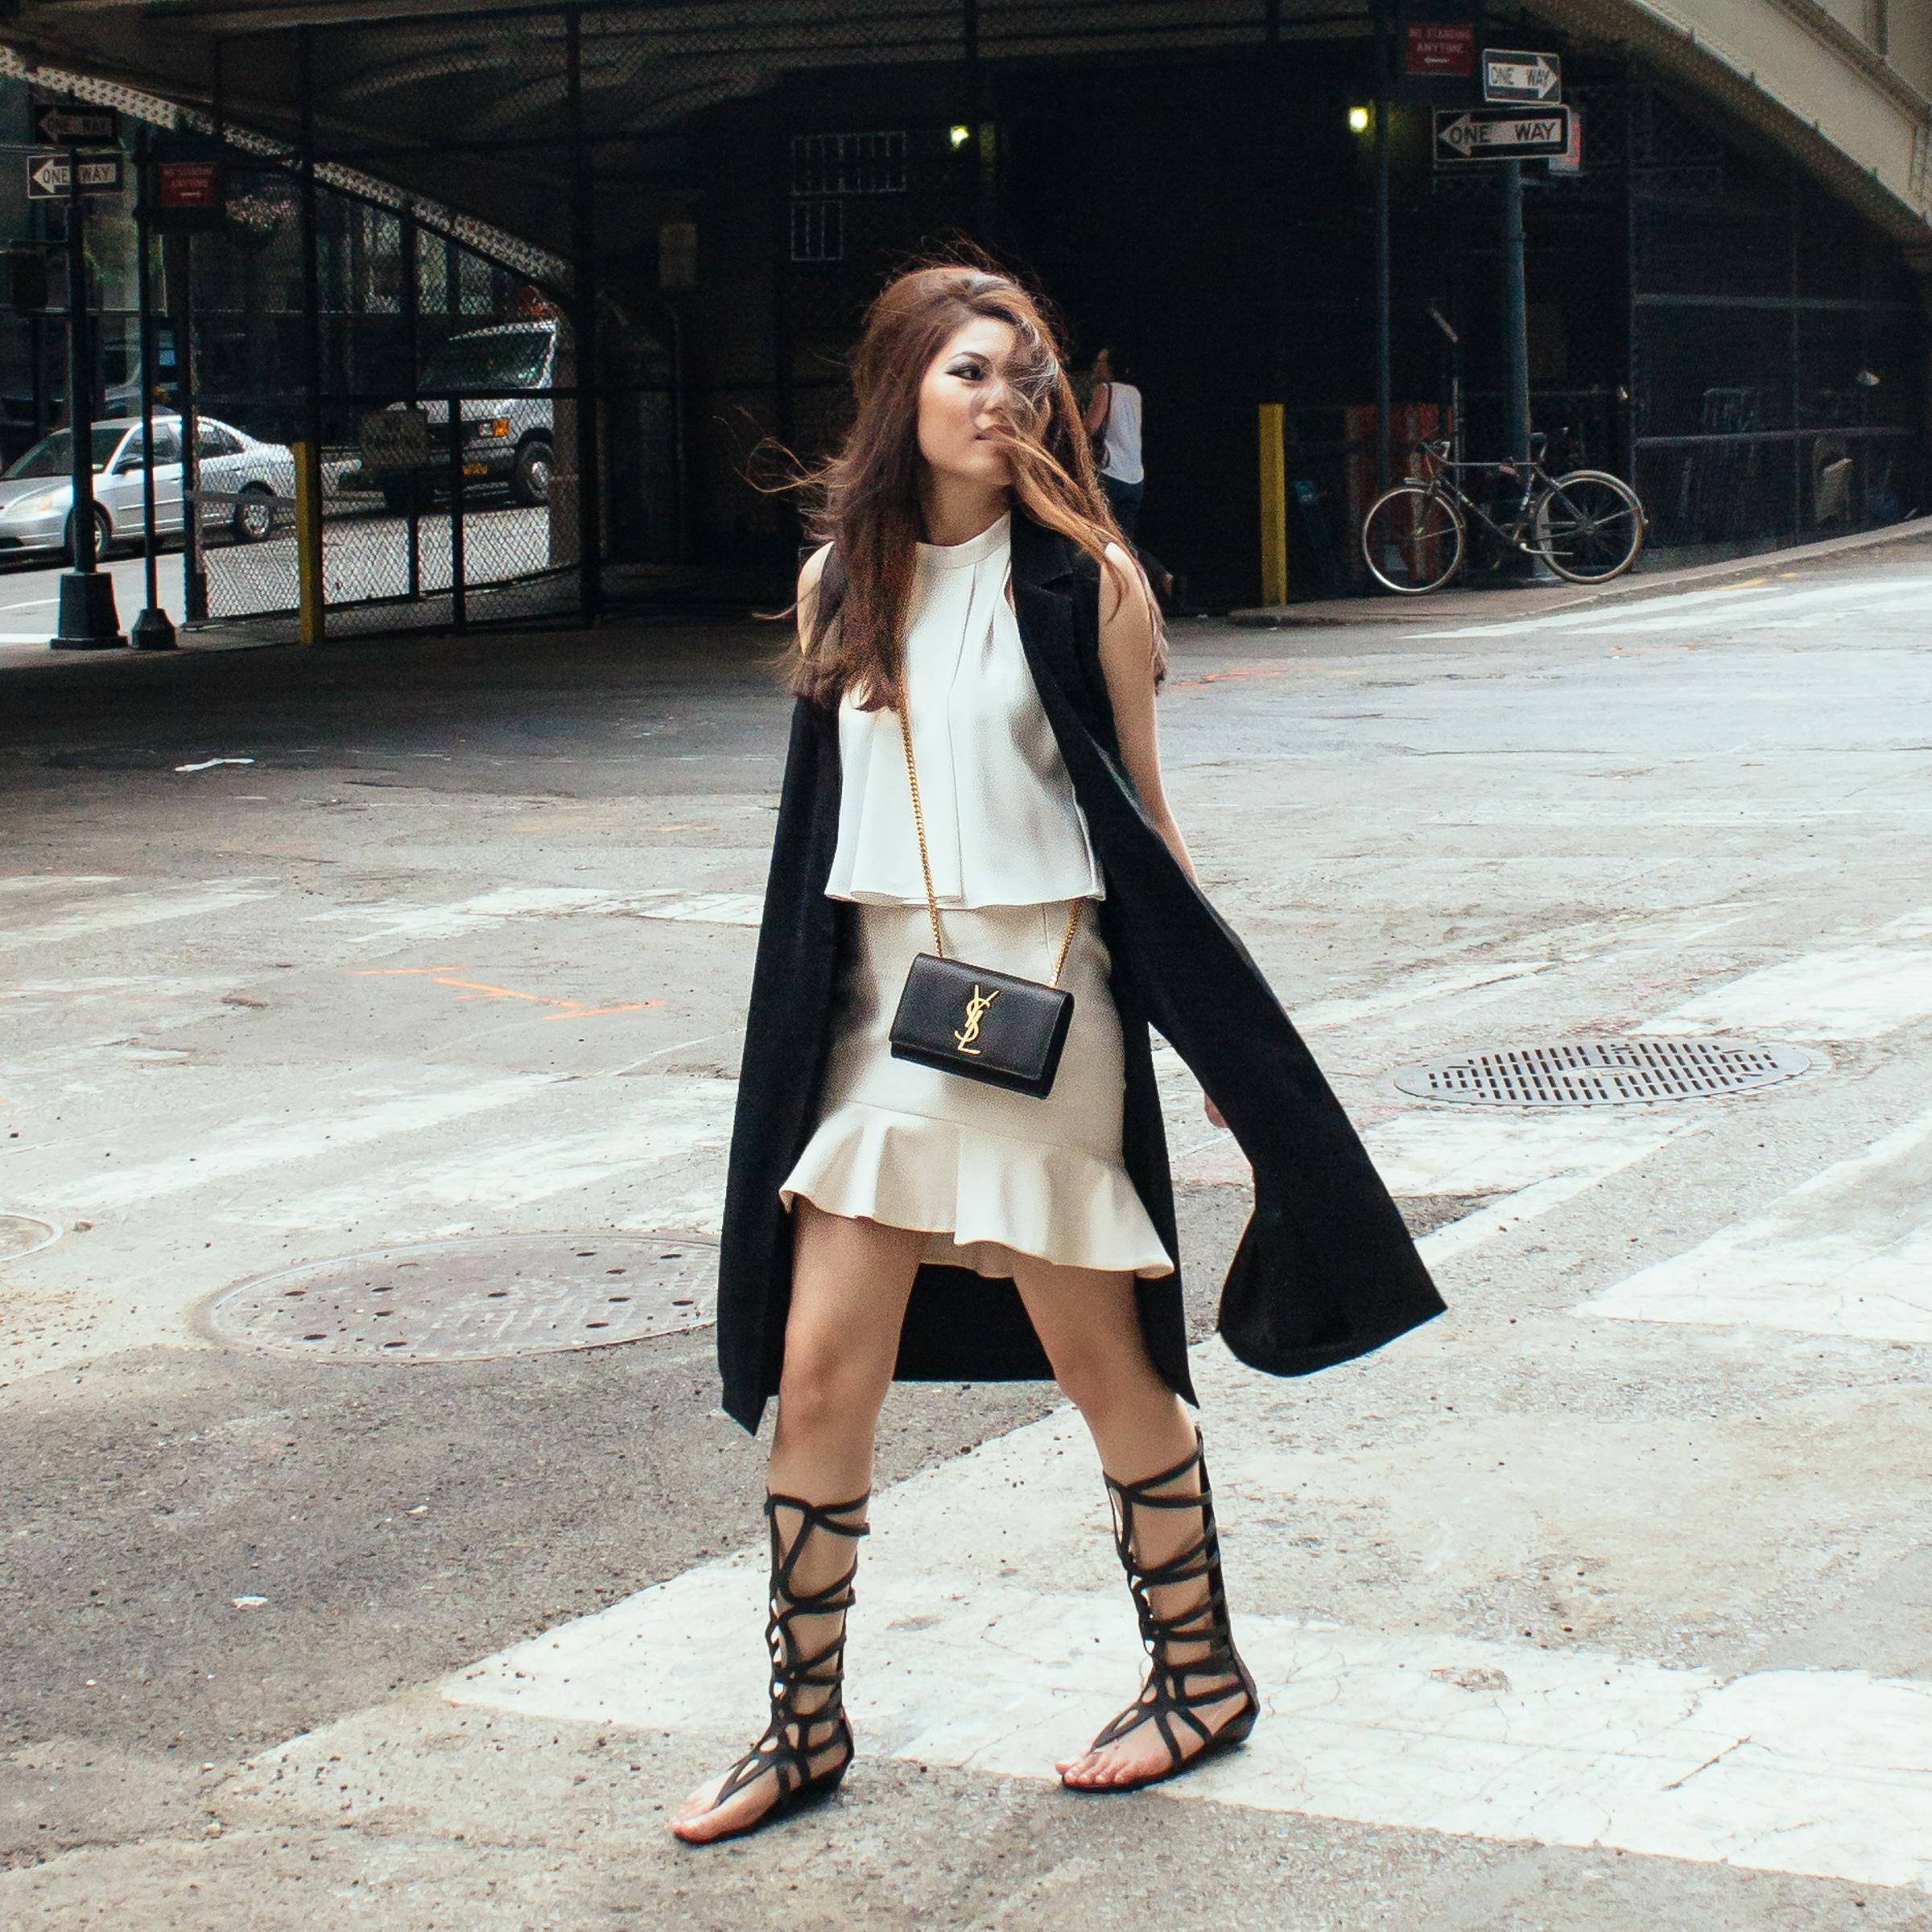 Saint Laurent Paris Crossbody Bag ( here ), Topshop Sleeveless Coat ( here ),Gladiator Sandals ( similar here )